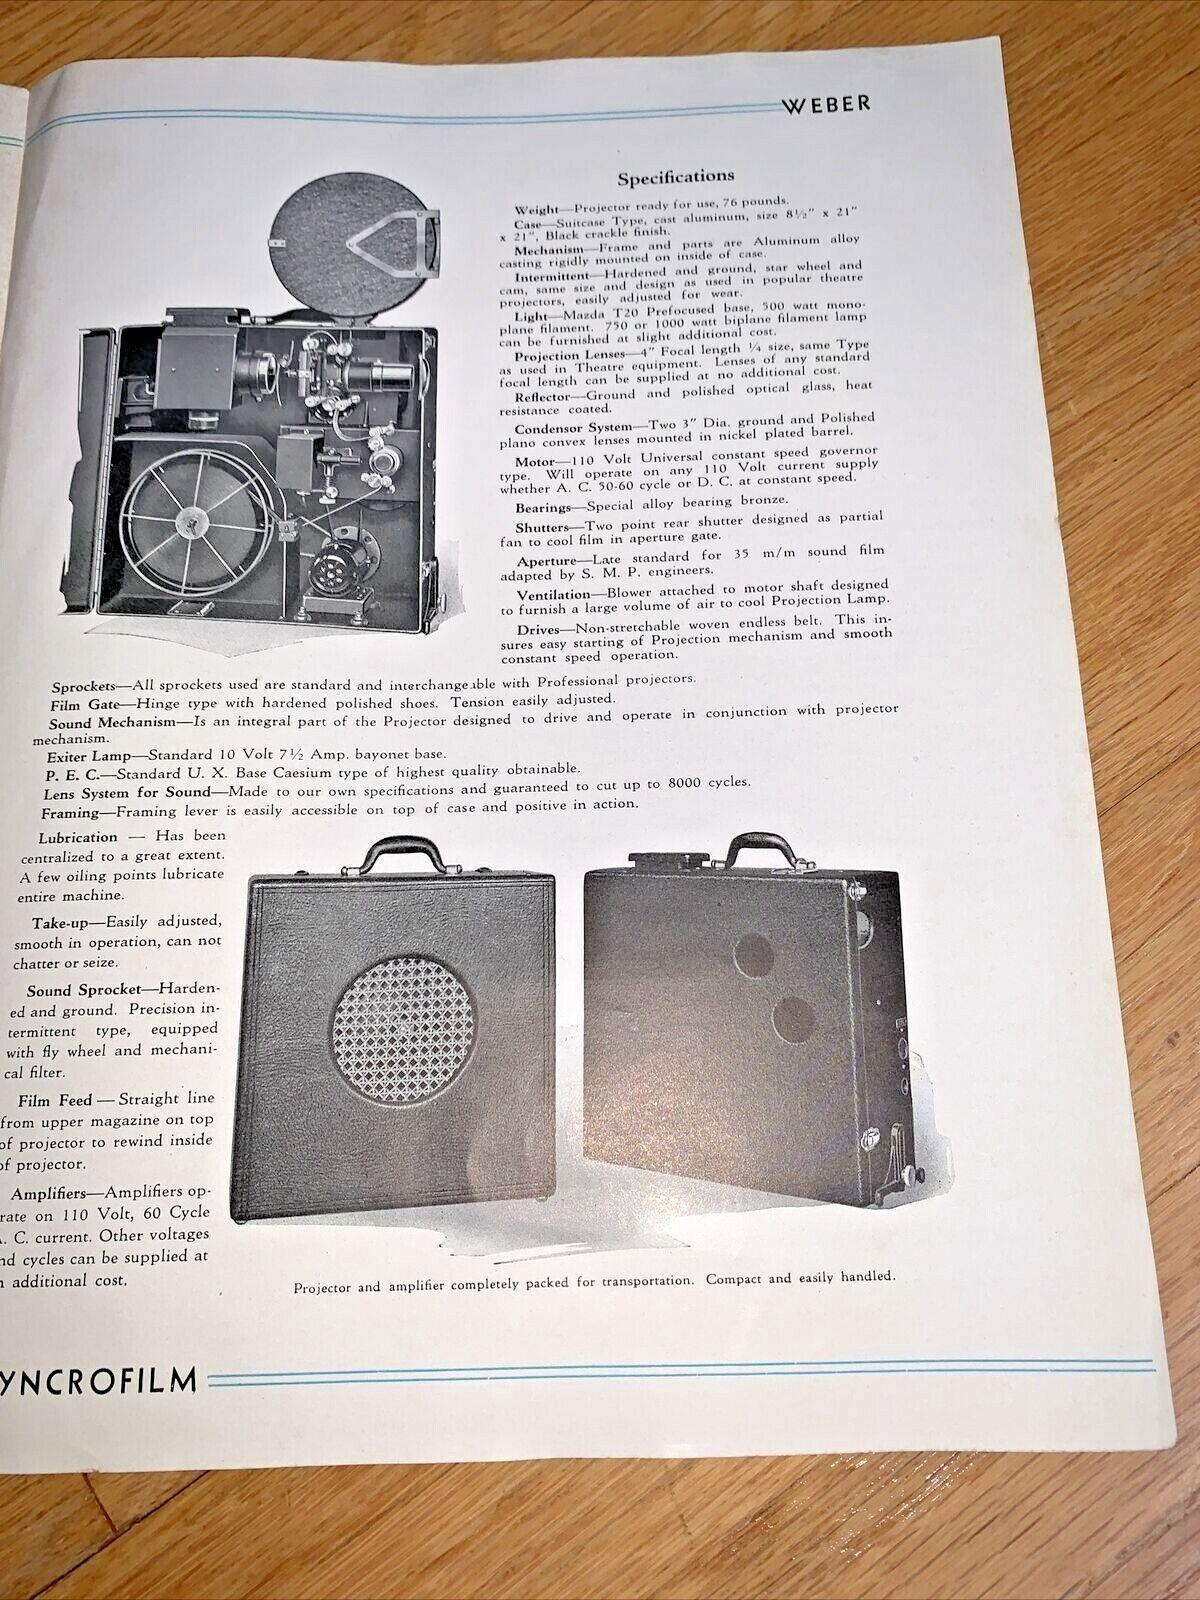 1930 s SYNCROFILM - WEBER MACHINE CORP. Brochure 35m/m Sound Visual Projector - $14.95